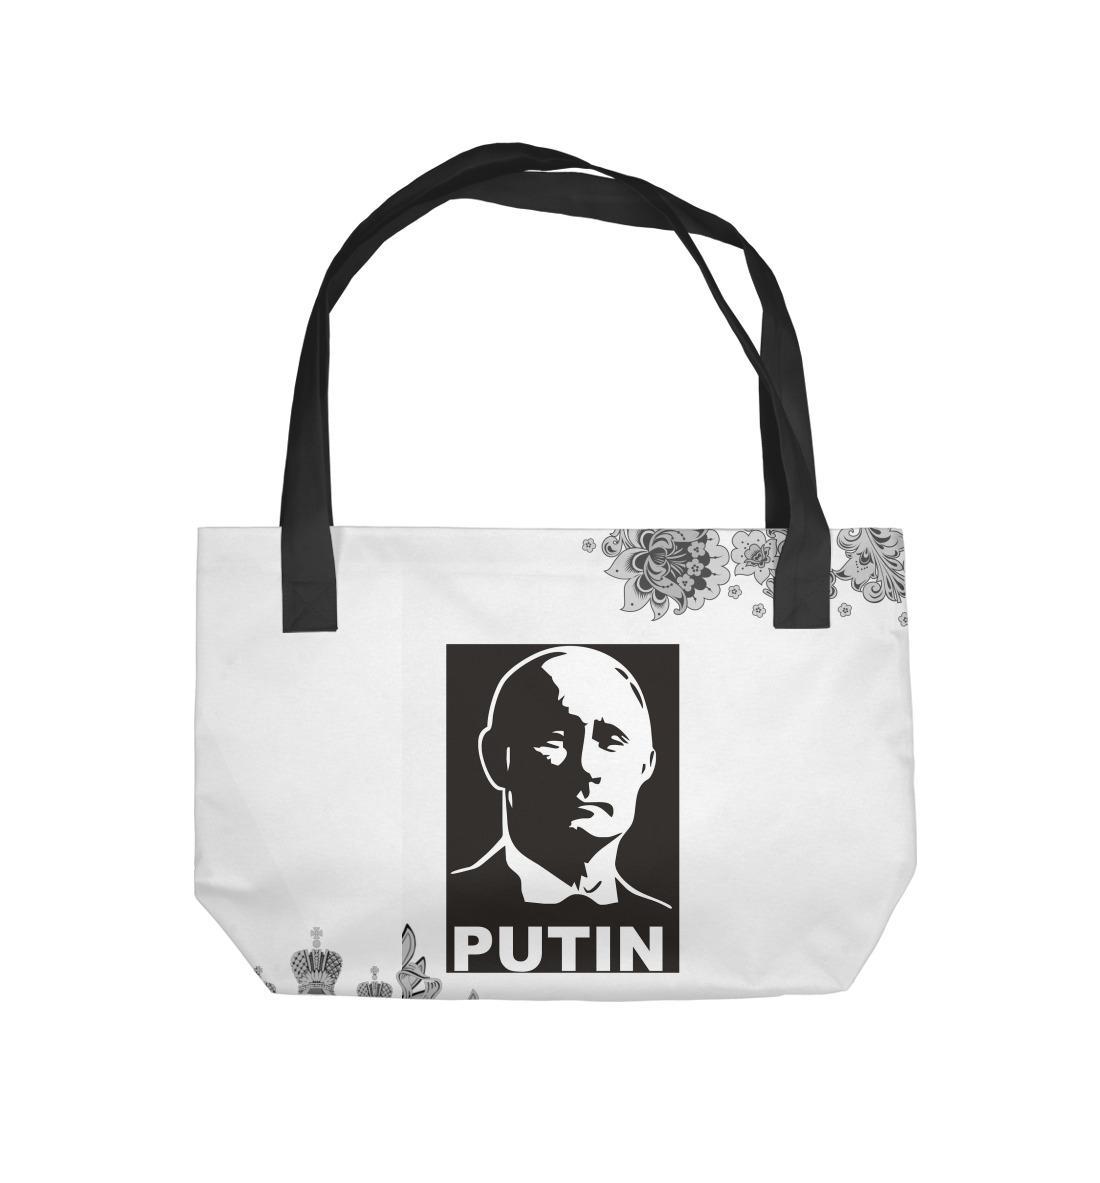 Фото - Putin swagimir putin